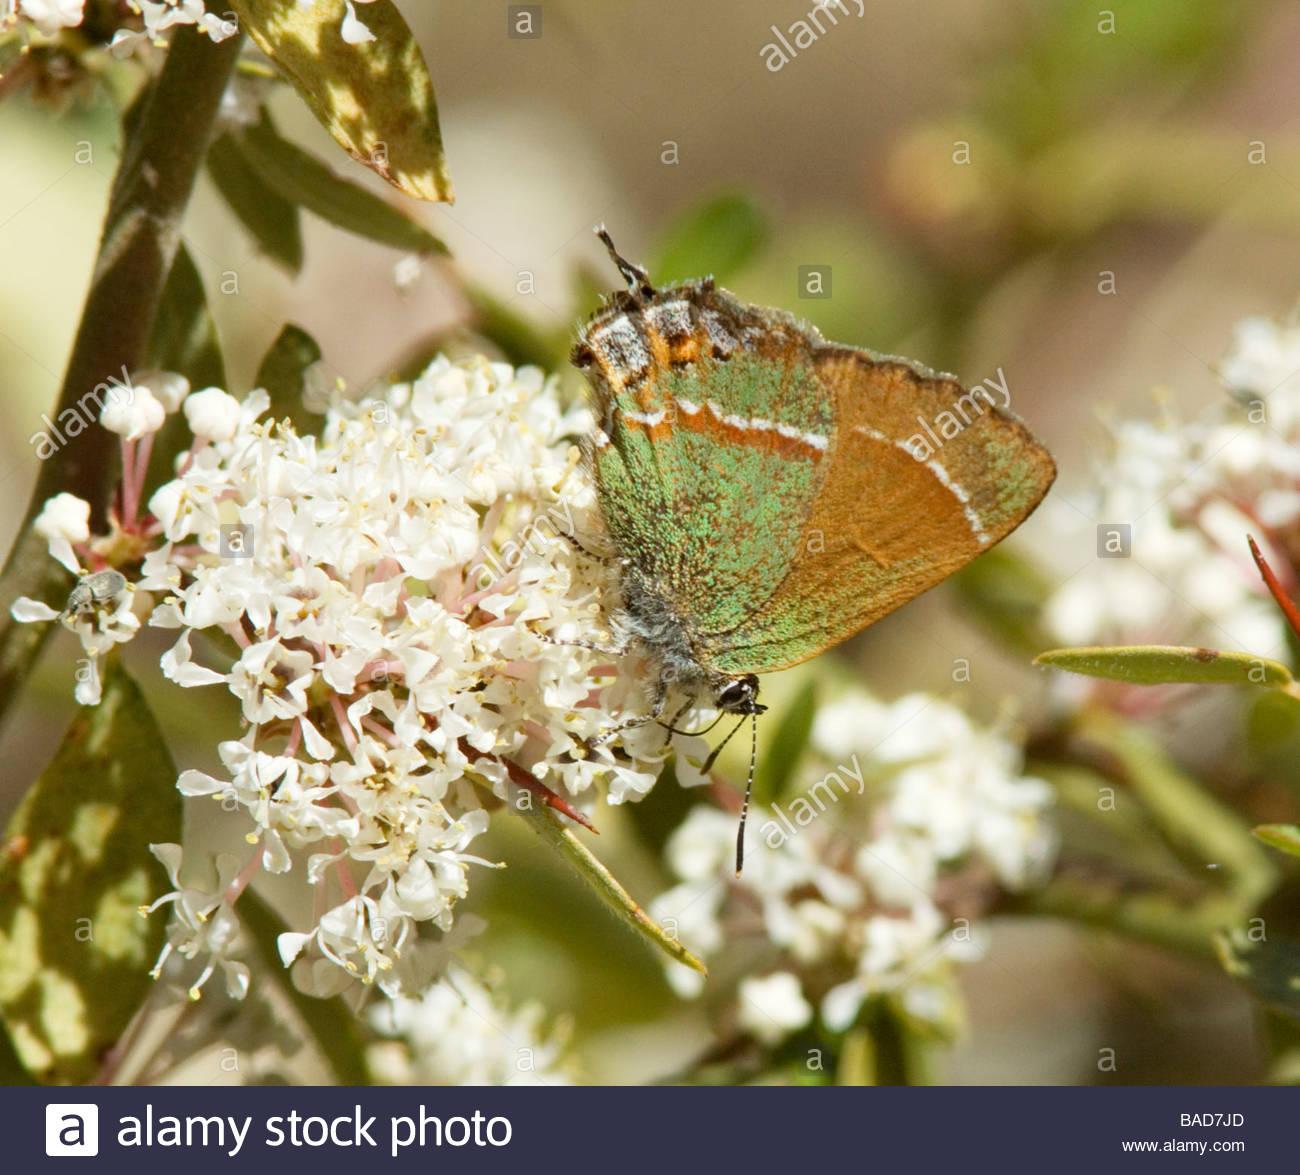 Siva Juniper Hairstreak Callophrys gryneus Mitoura gryneus siva alimentar flores blancas mariposa Foto de stock